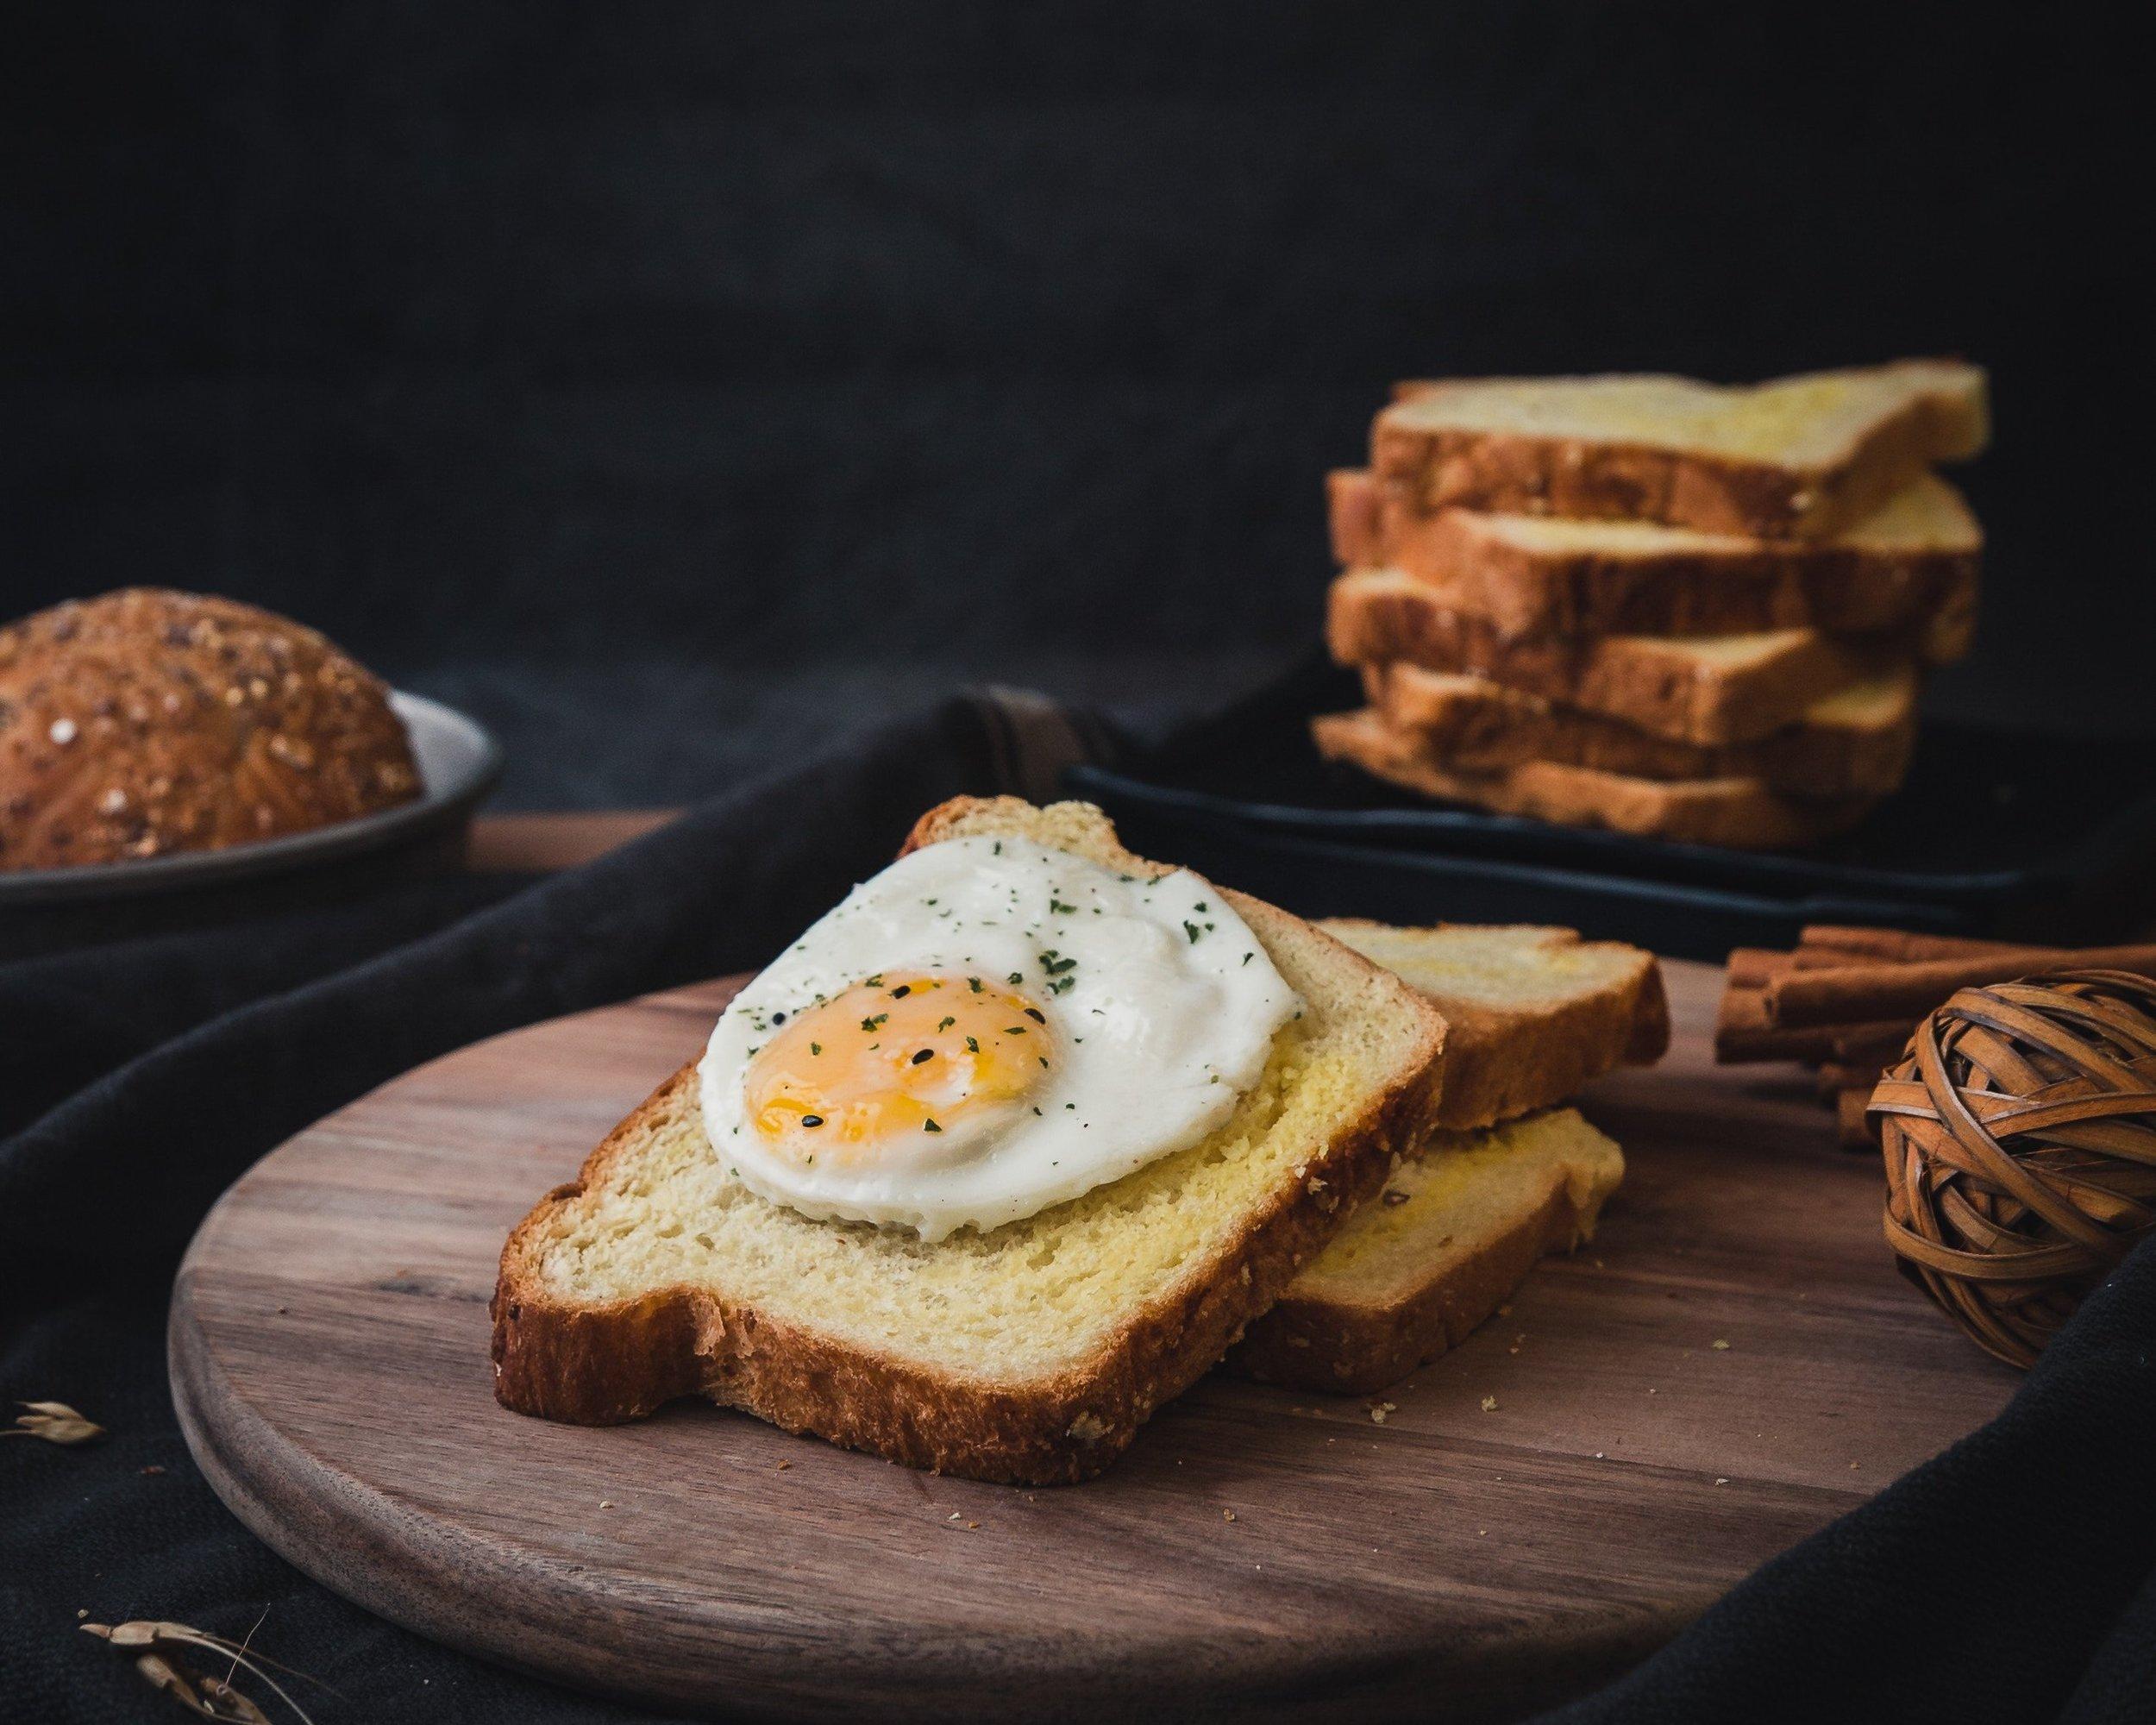 Breakfast Sandwiches - Served on Denver Bread Company baguette.- bacon, egg, cheese, basil aioli, tomato- chorizo, egg, cheese, salsa rojo- potato, egg, cheese, salsa verde, tomato*served with side of breakfast potatoes. Fresh fruit available.